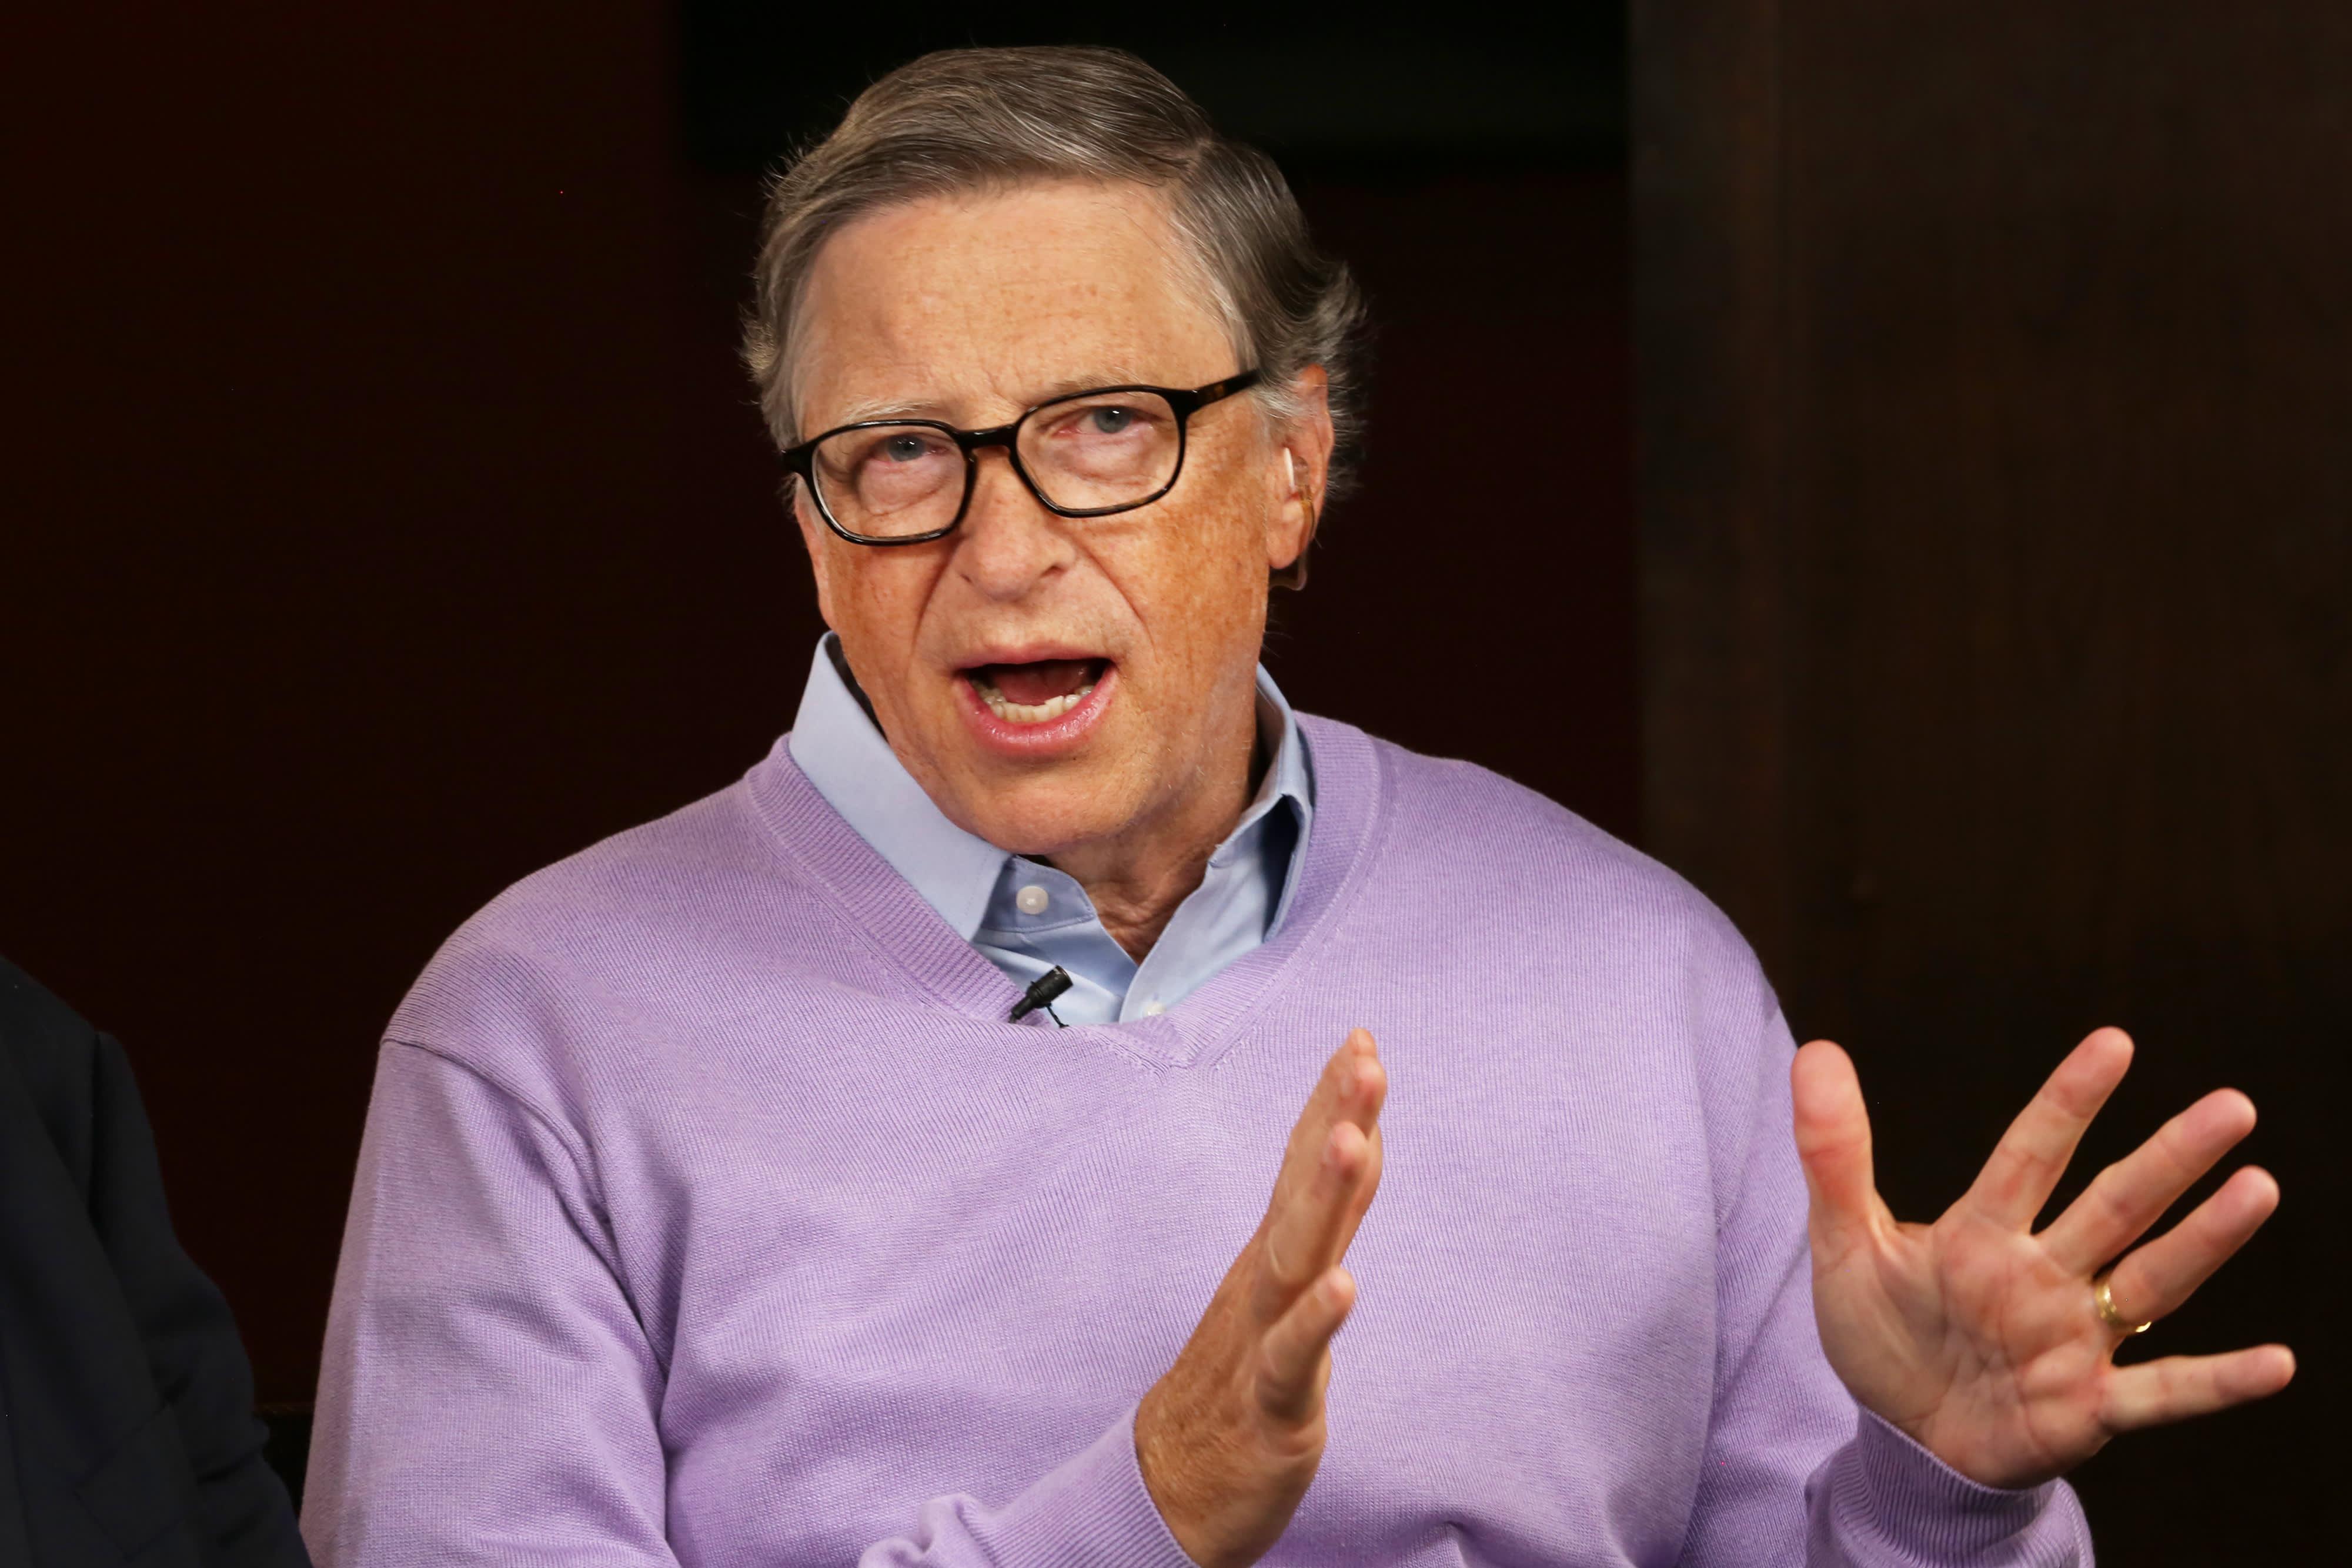 Listen Facebook Engineers Ai Speech Program Clones Bill Gates Voice